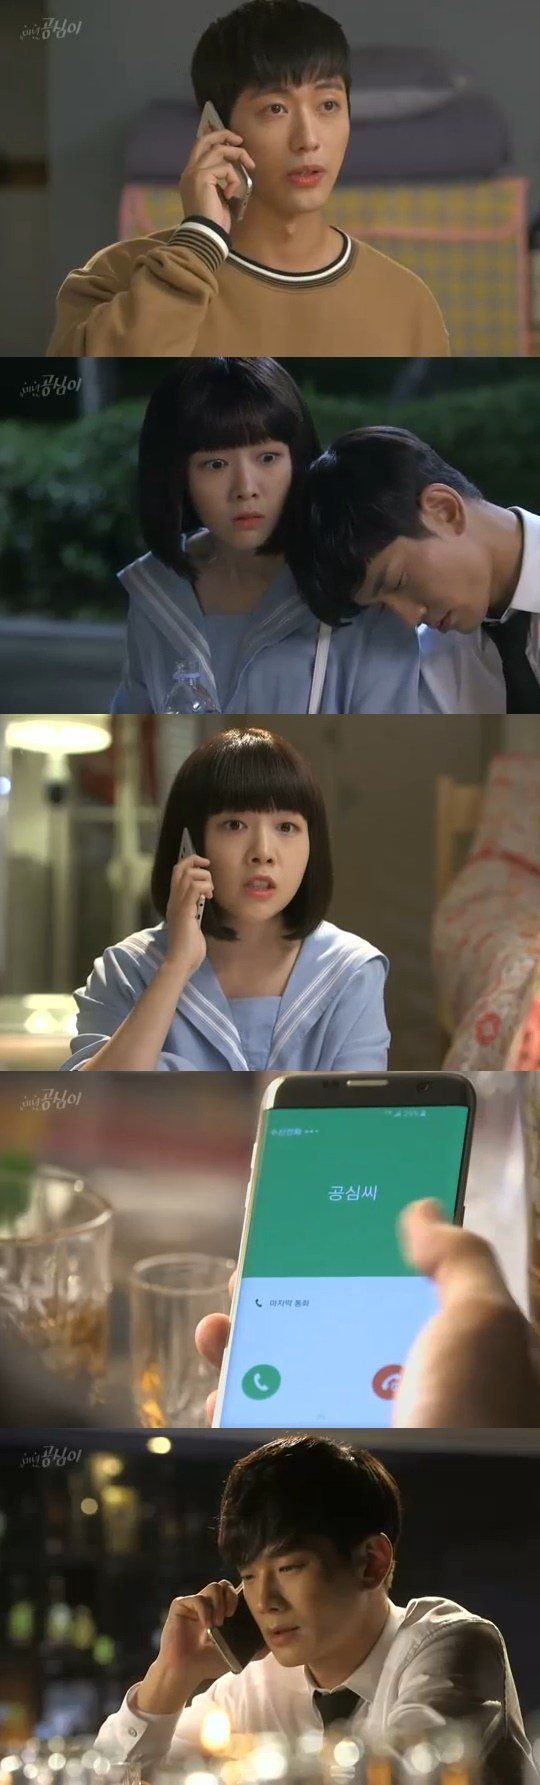 [Spoiler] 'Beautiful Gong Shim' Min-ah, gets help from Nam Goong-min while  comforting On Joo-wan